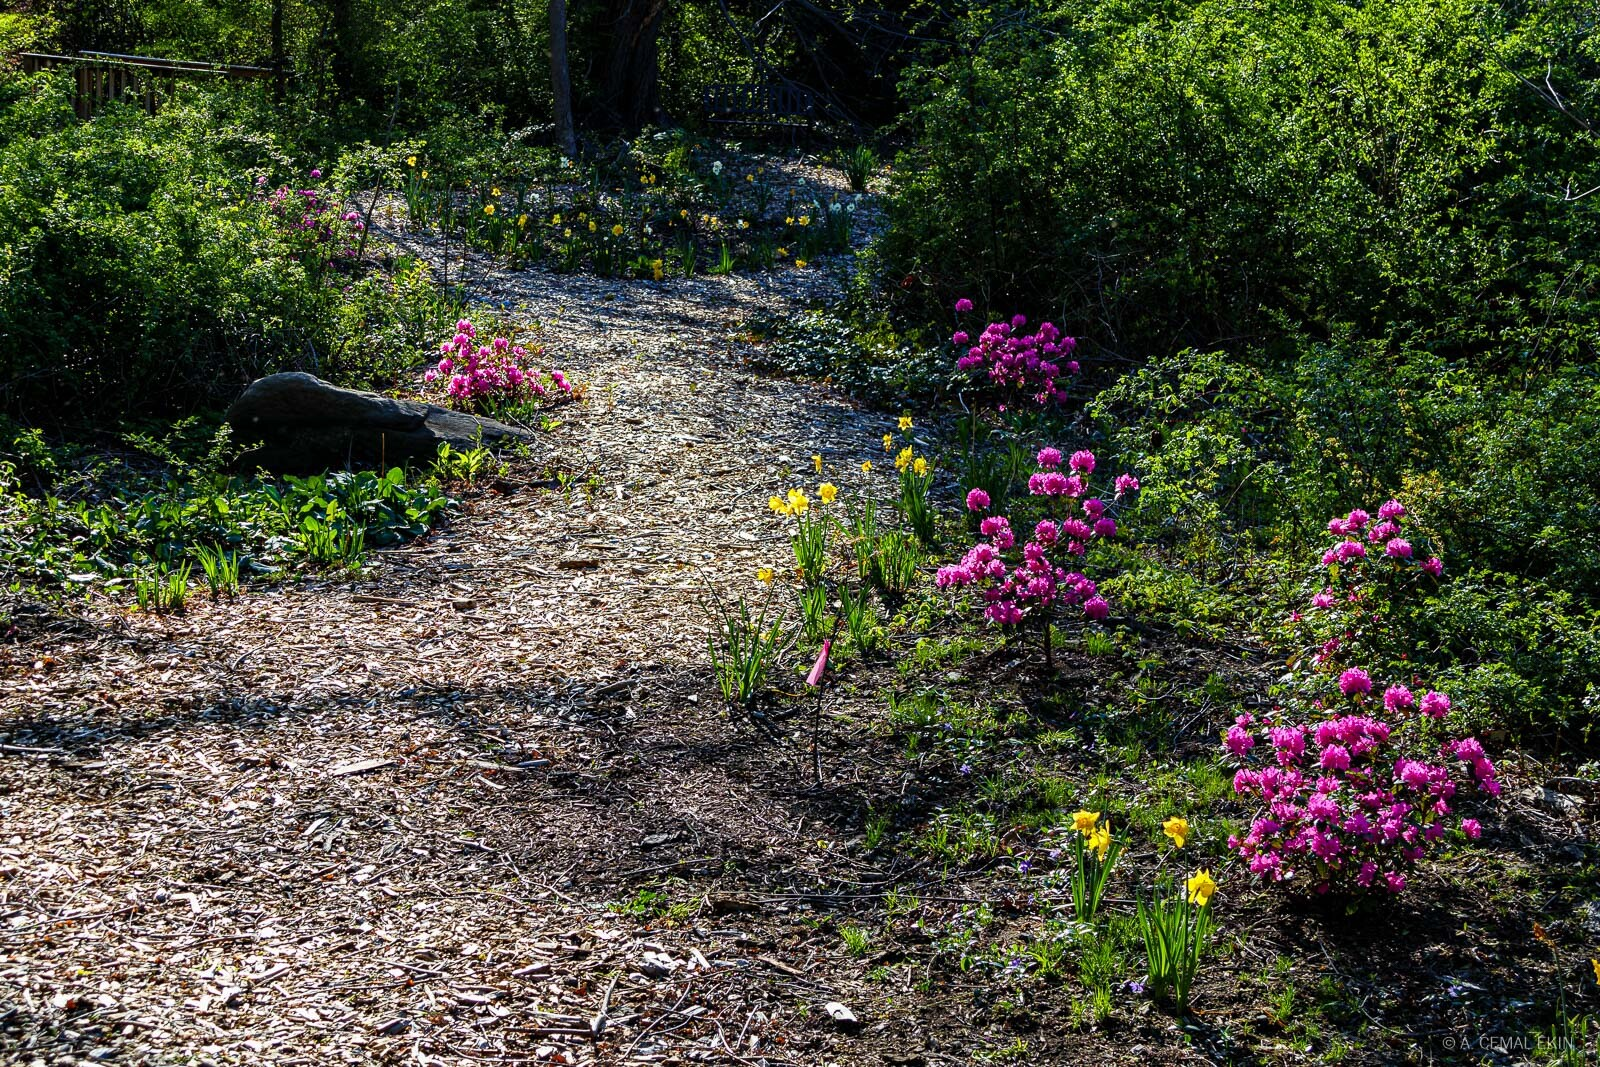 Wilderness to pleasant path